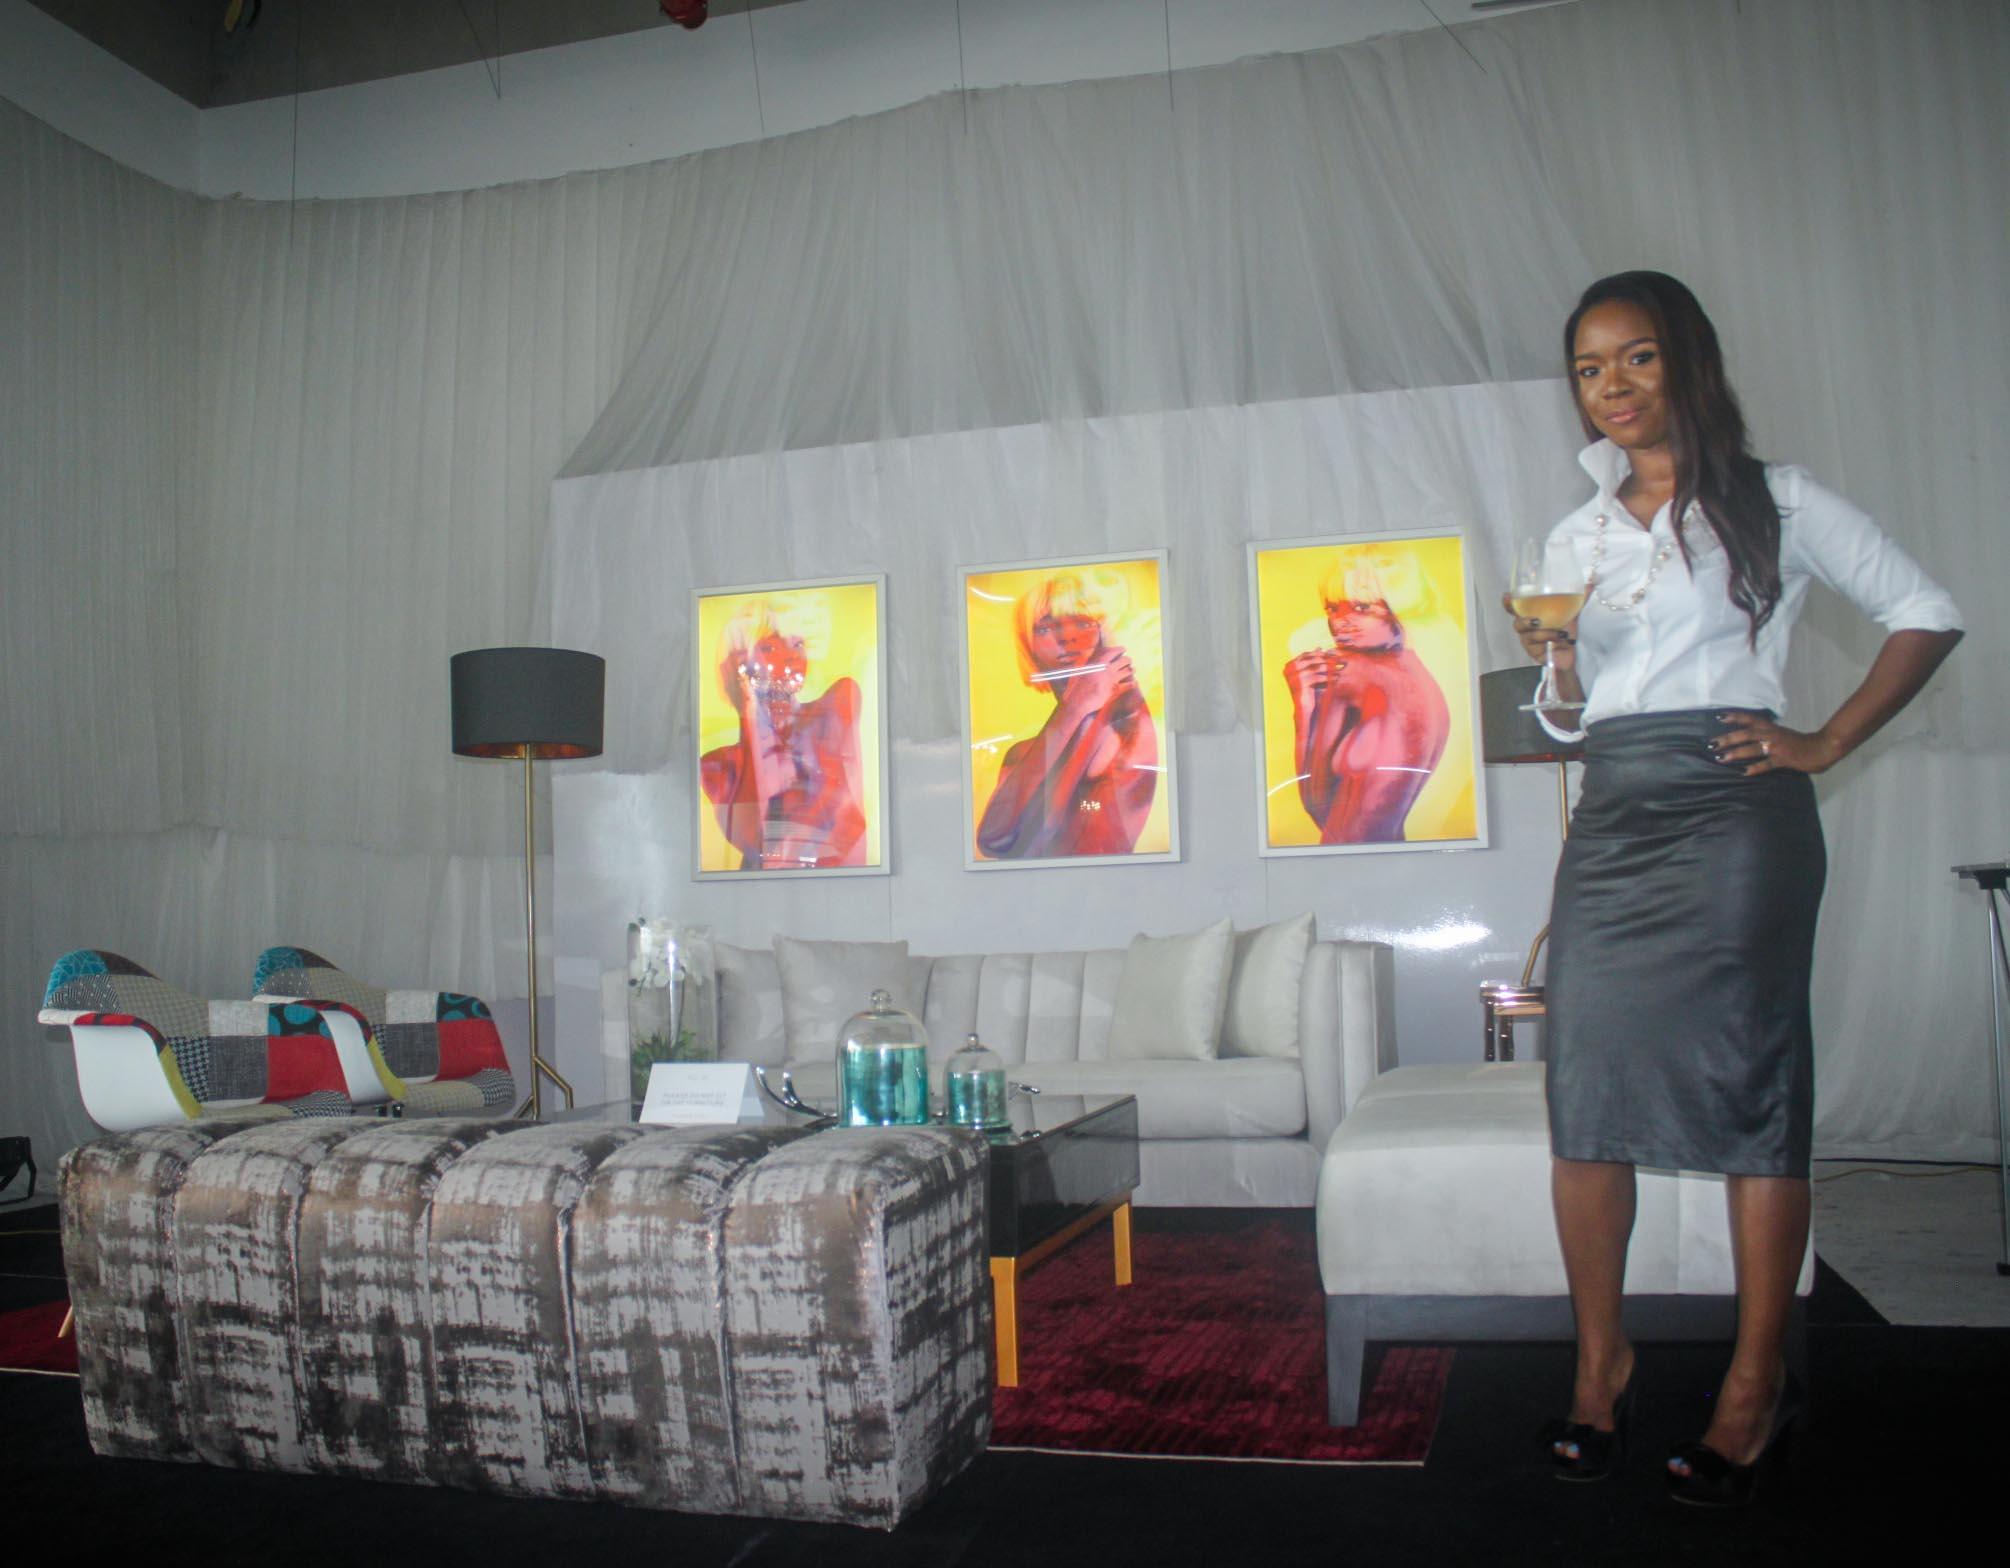 NU MI Design House Launches Interior Design & Home ware At Luxury Exhibition – GLAMSQUAD MAGAZINE